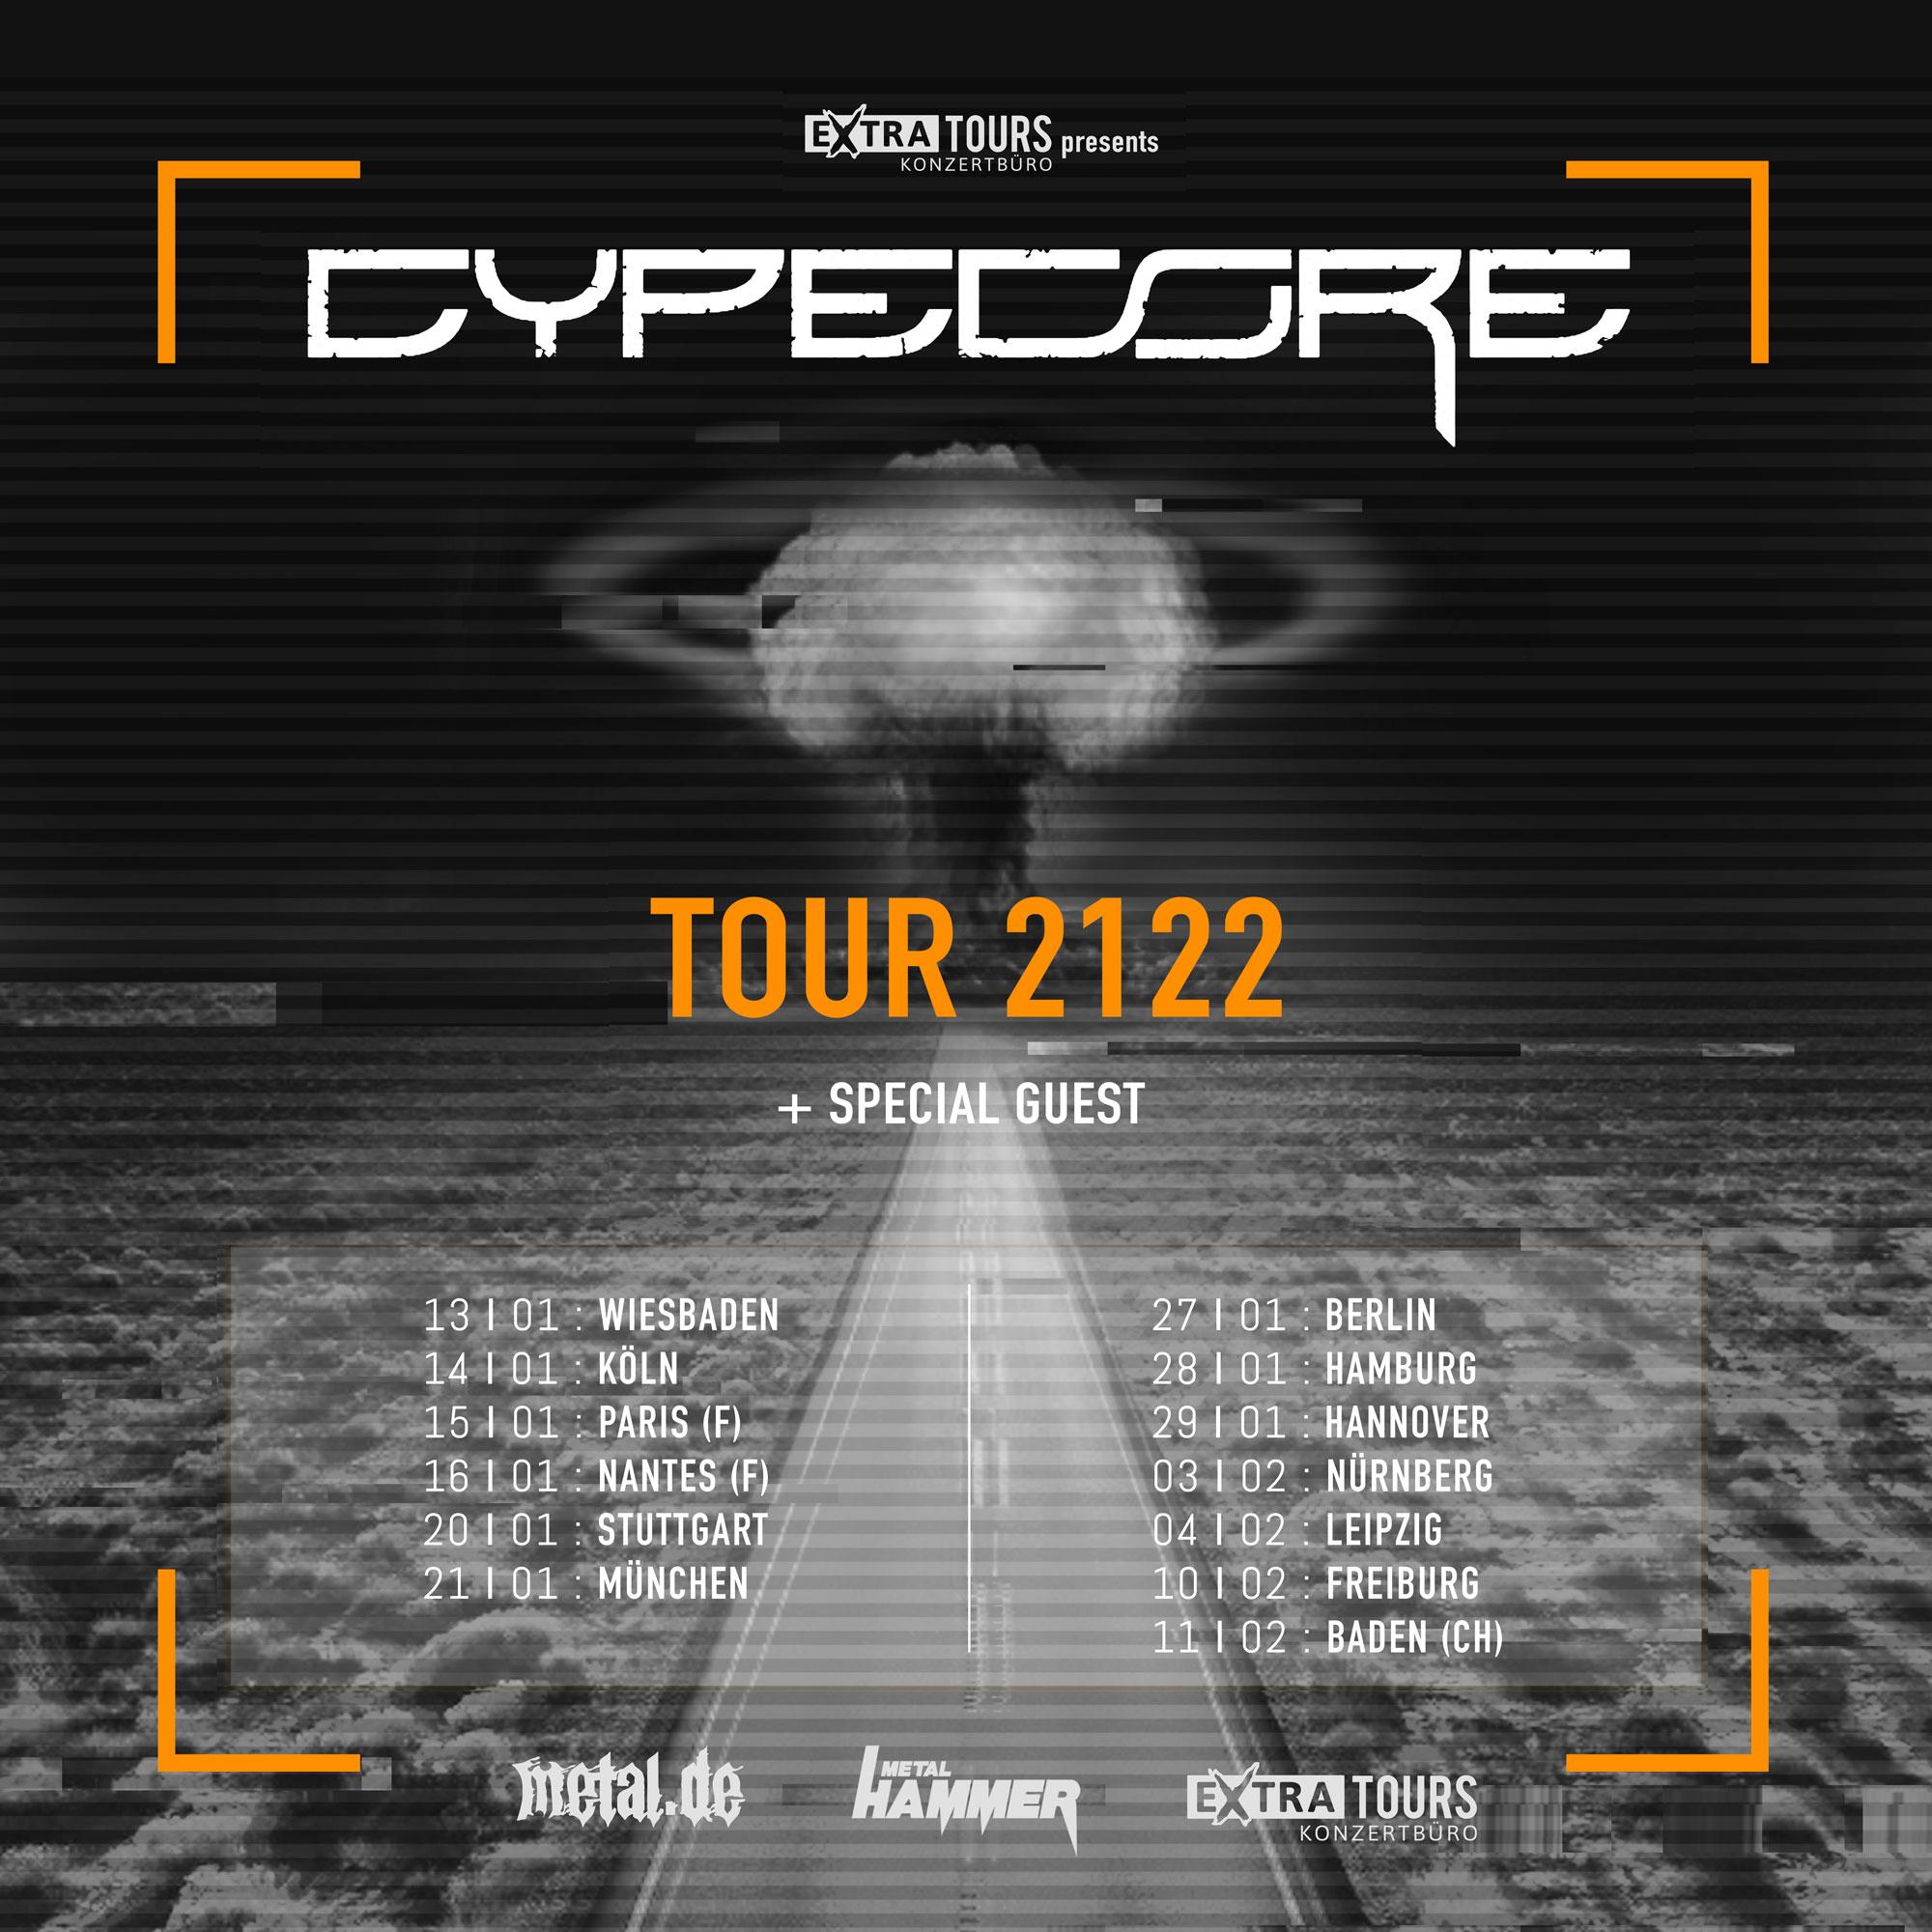 Bild Cypecore - Tour 2122 Poster